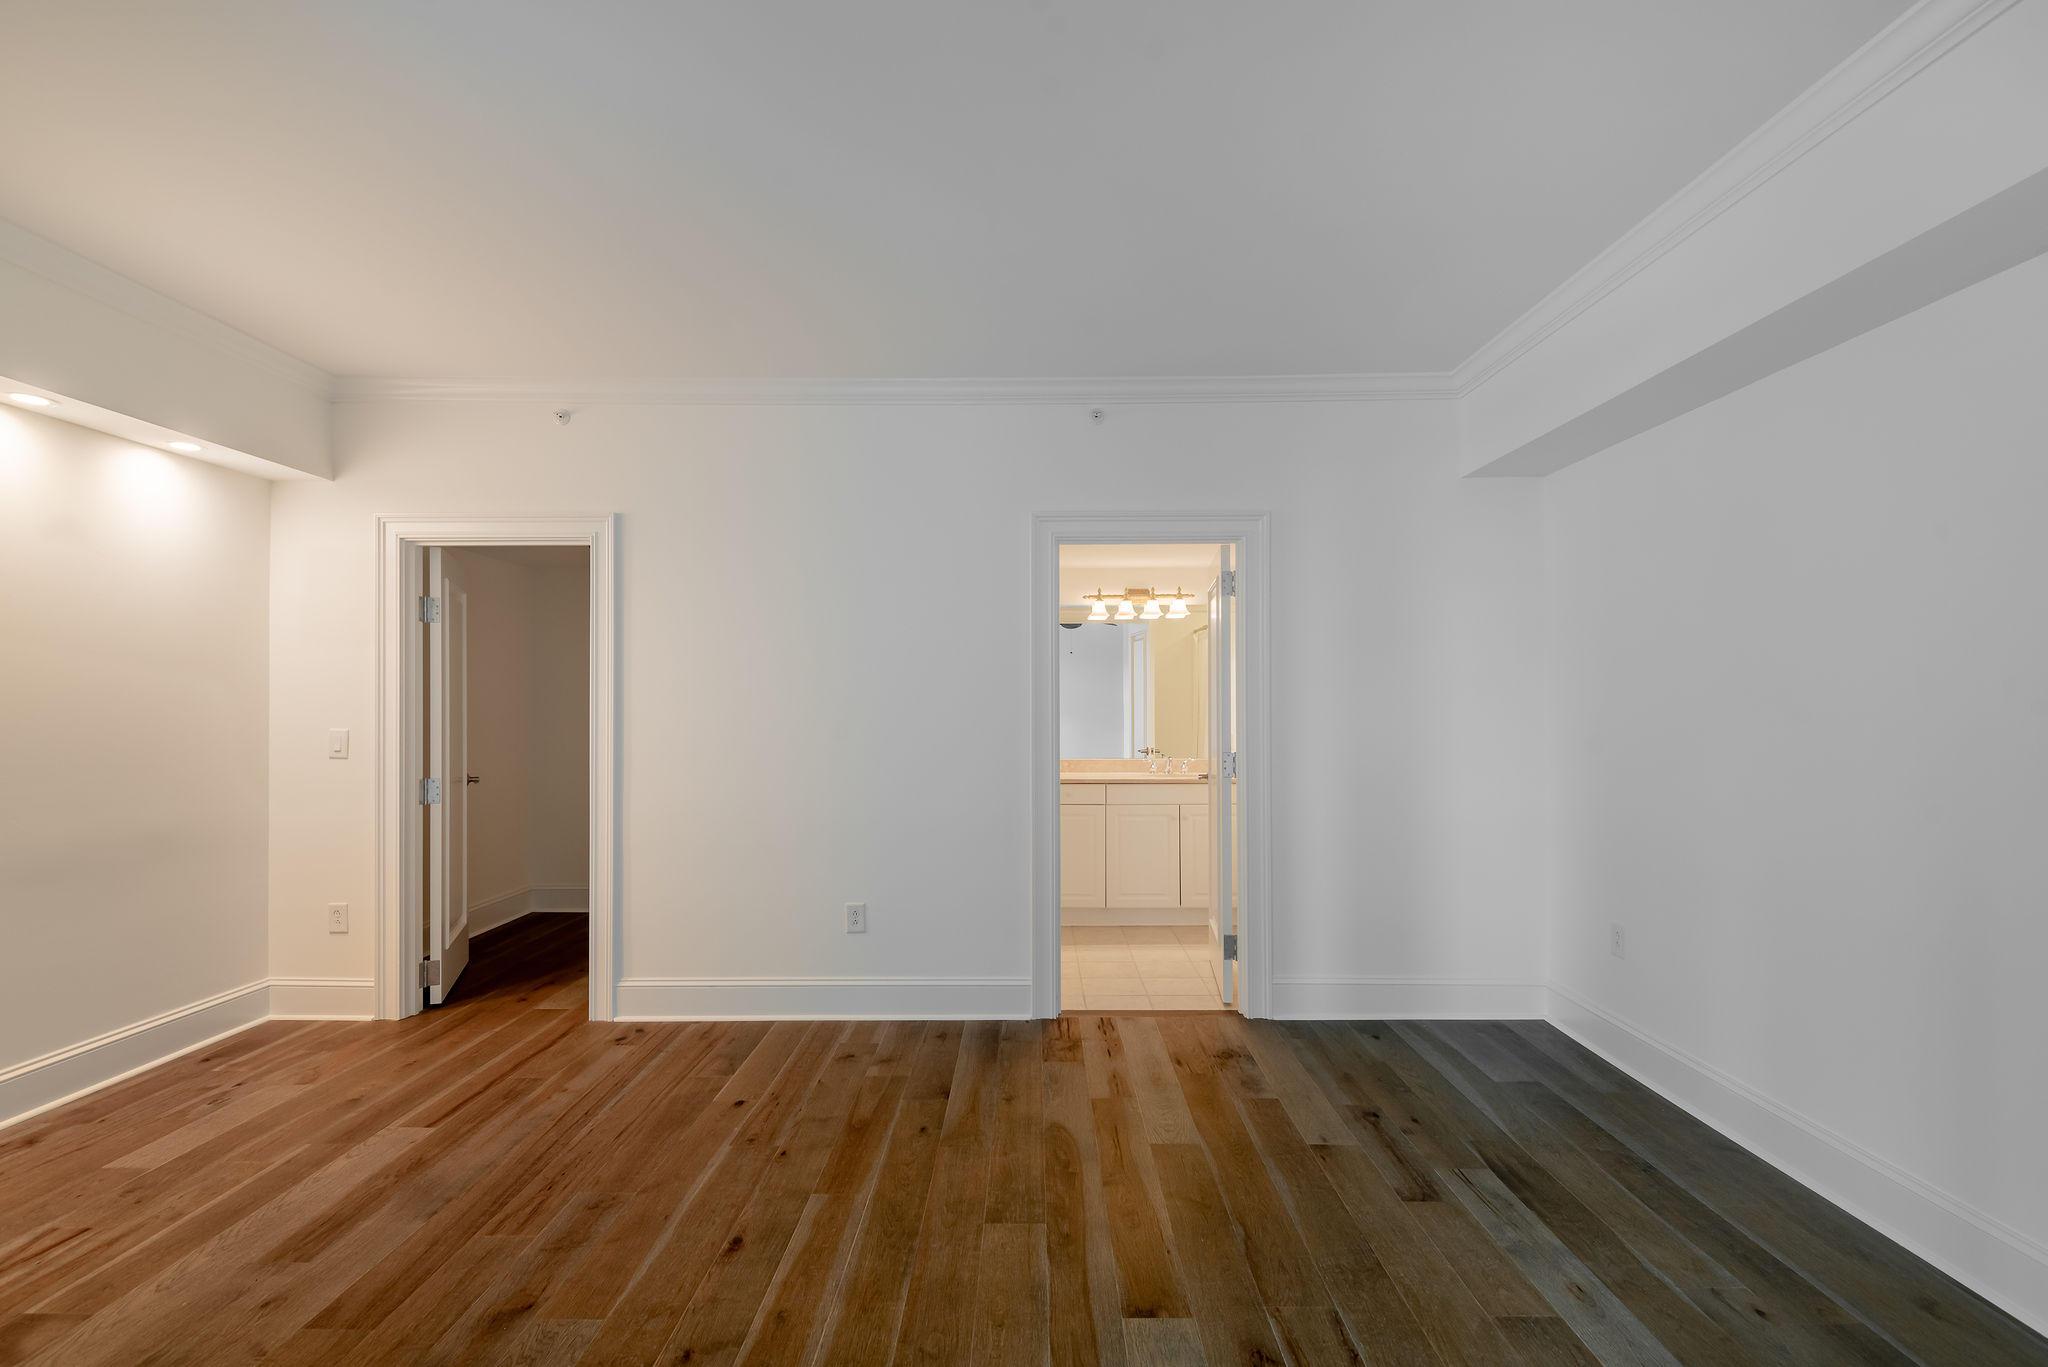 Renaissance On Chas Harbor Homes For Sale - 211 Plaza, Mount Pleasant, SC - 34